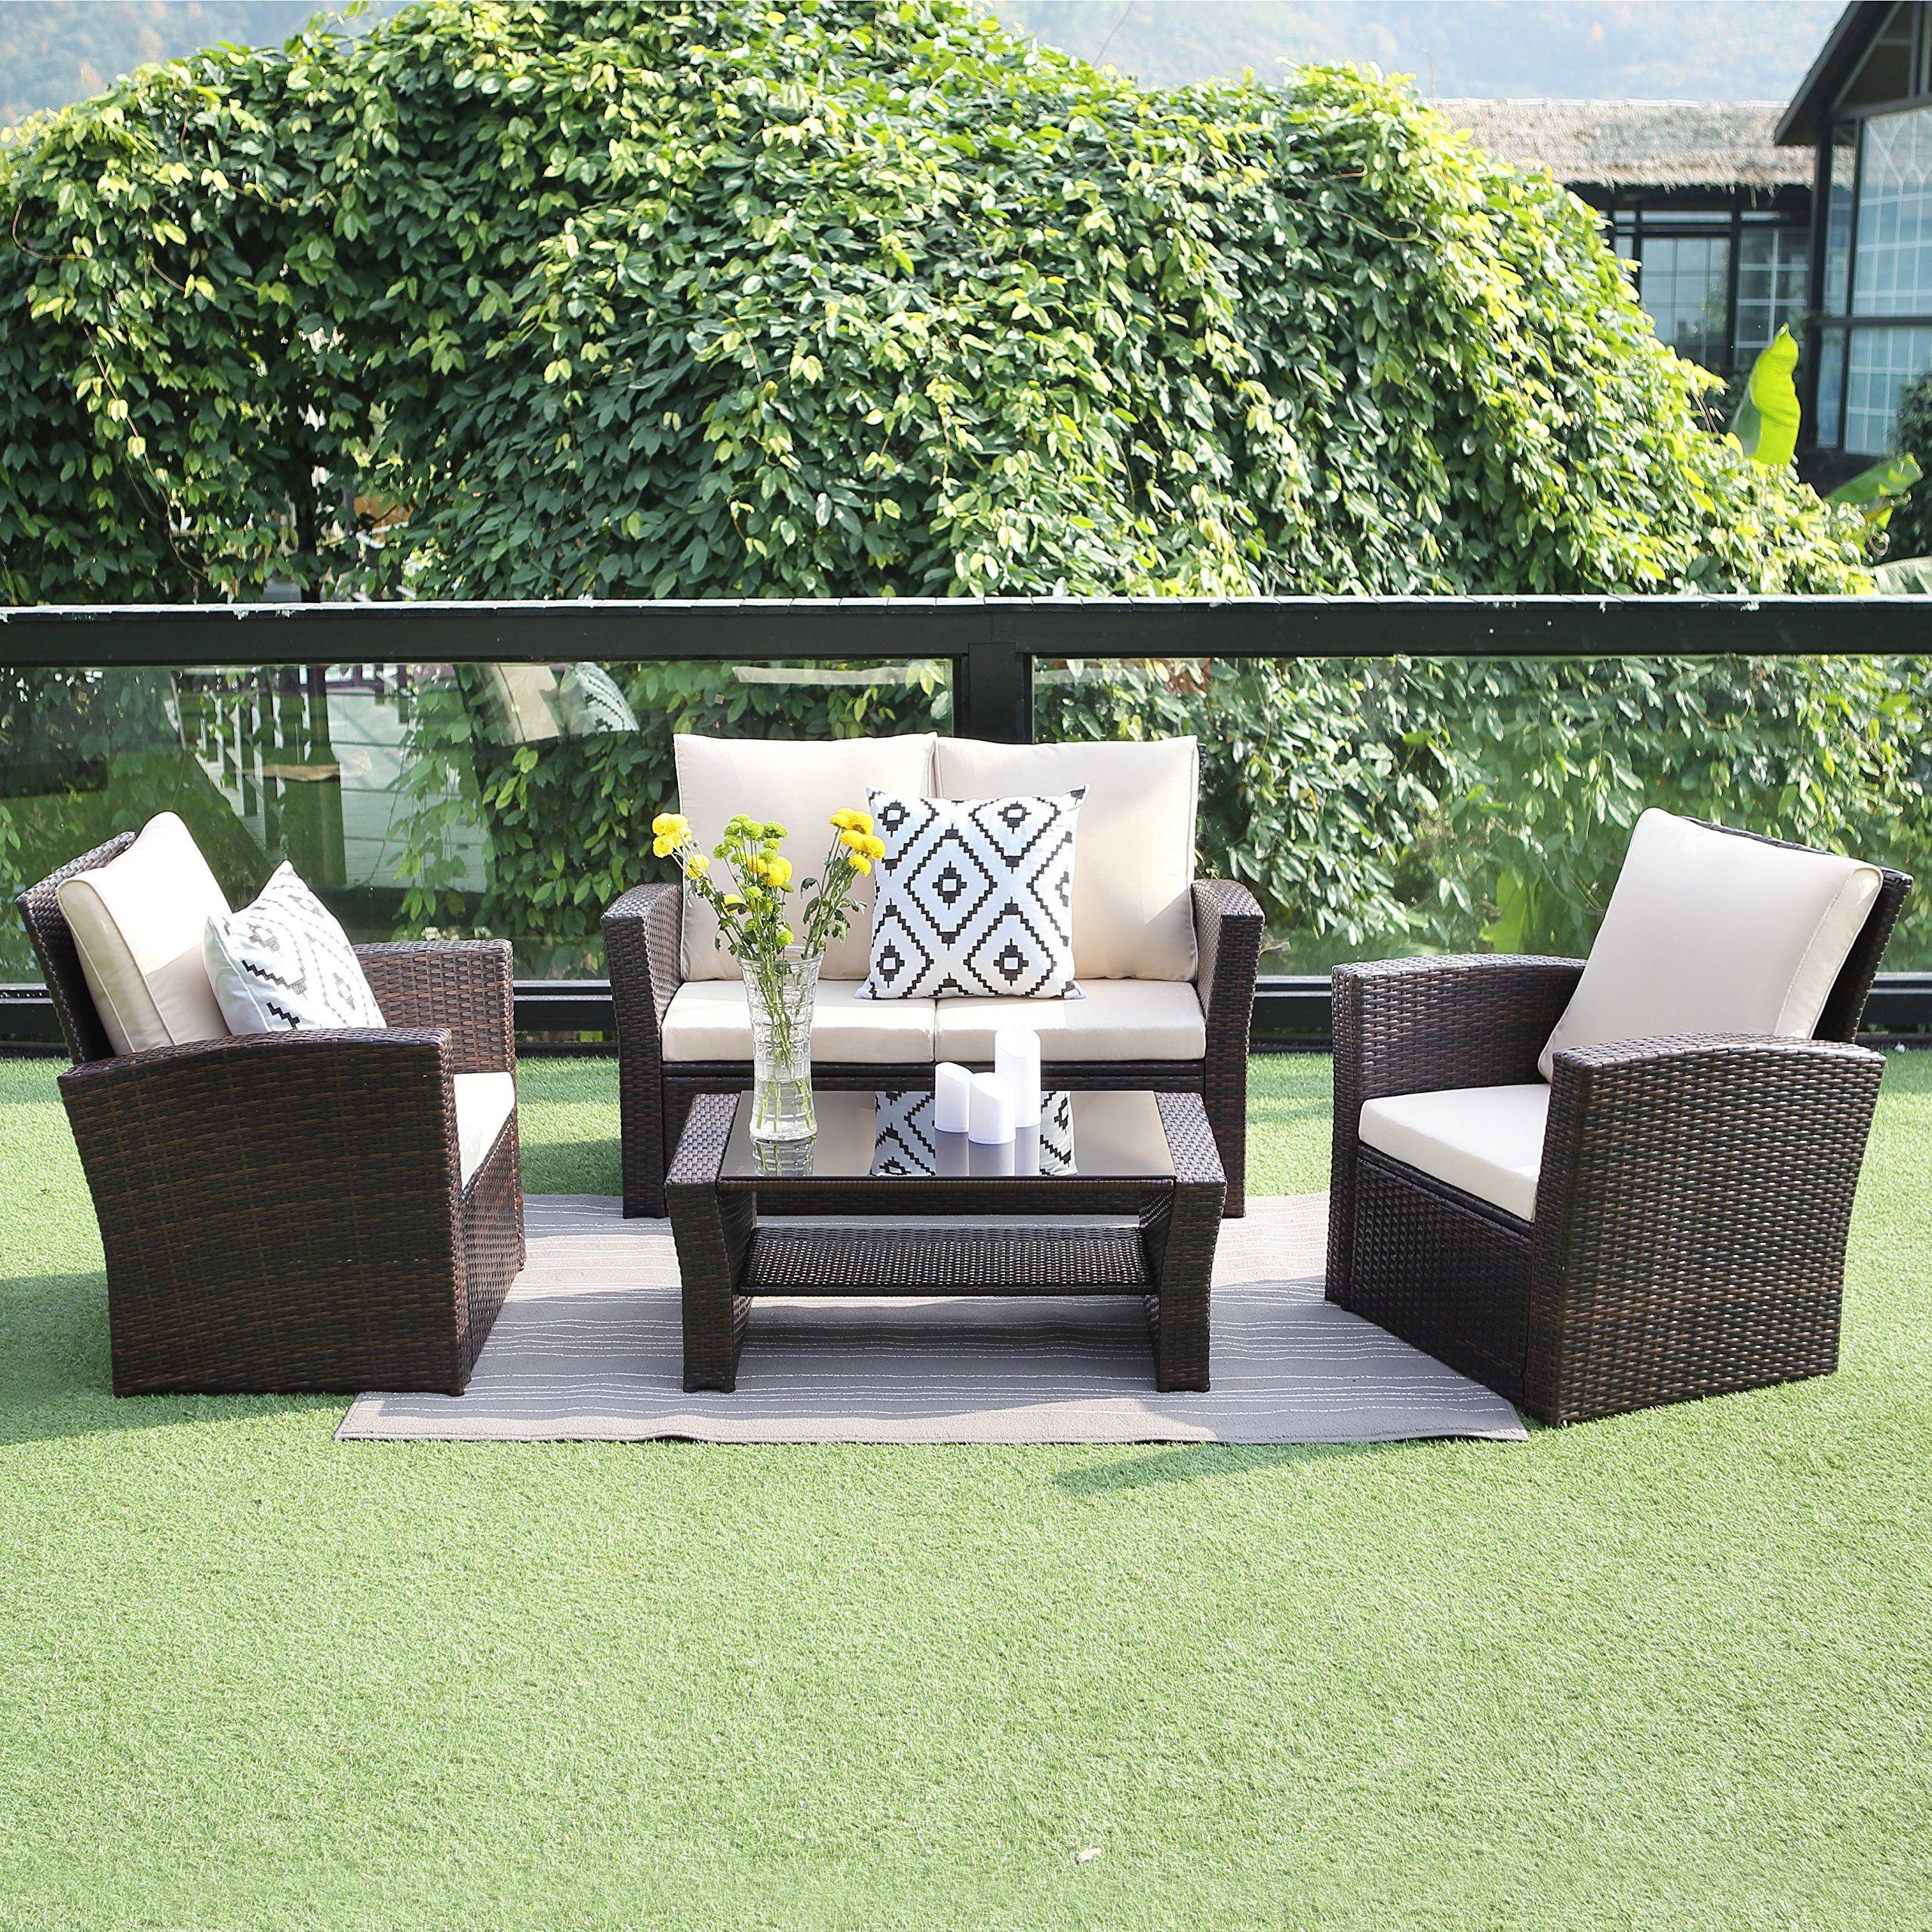 outdoor patio furniture set,wisteria lane 4 piece garden rattan sofa